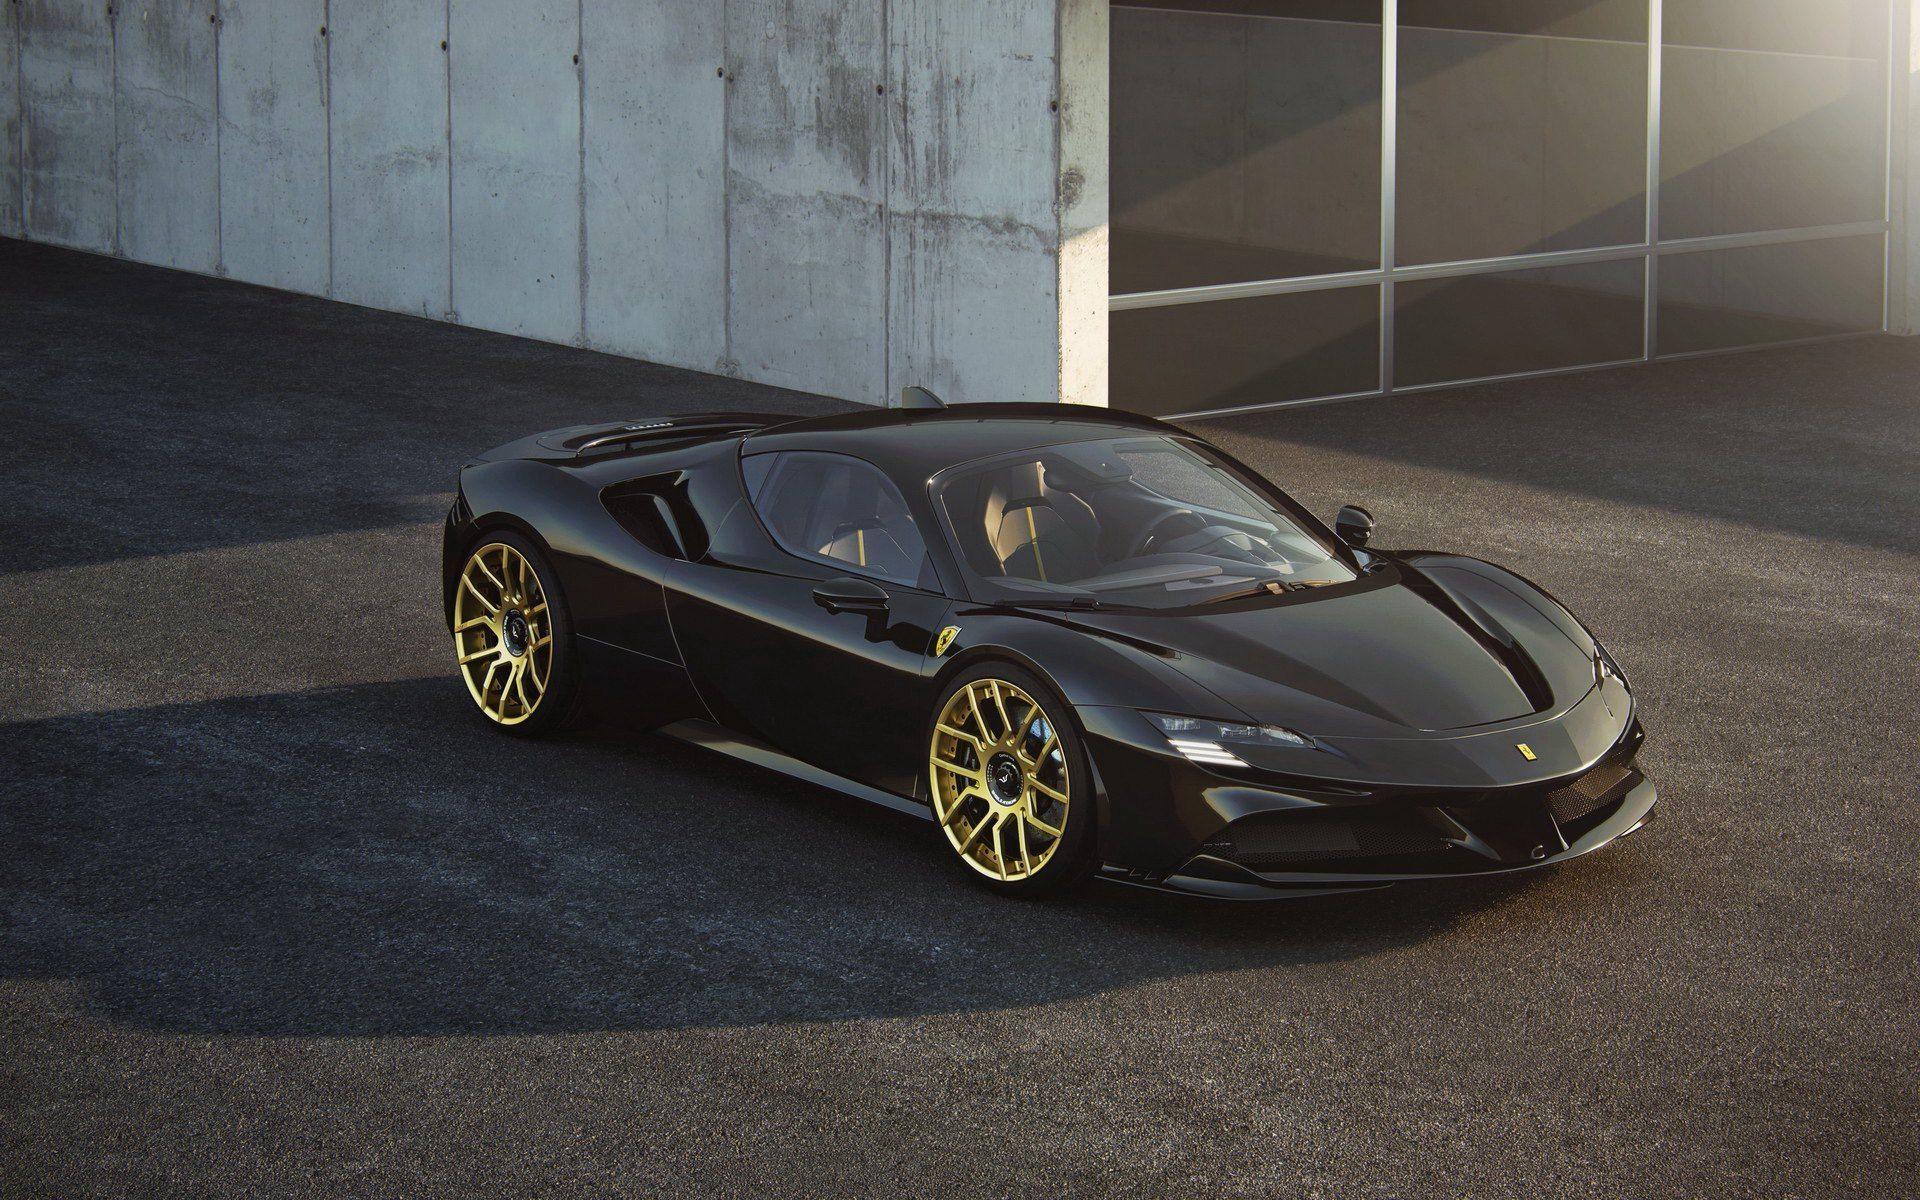 Ferrari_SF90_Stradale_by_Wheelsandmore_0002